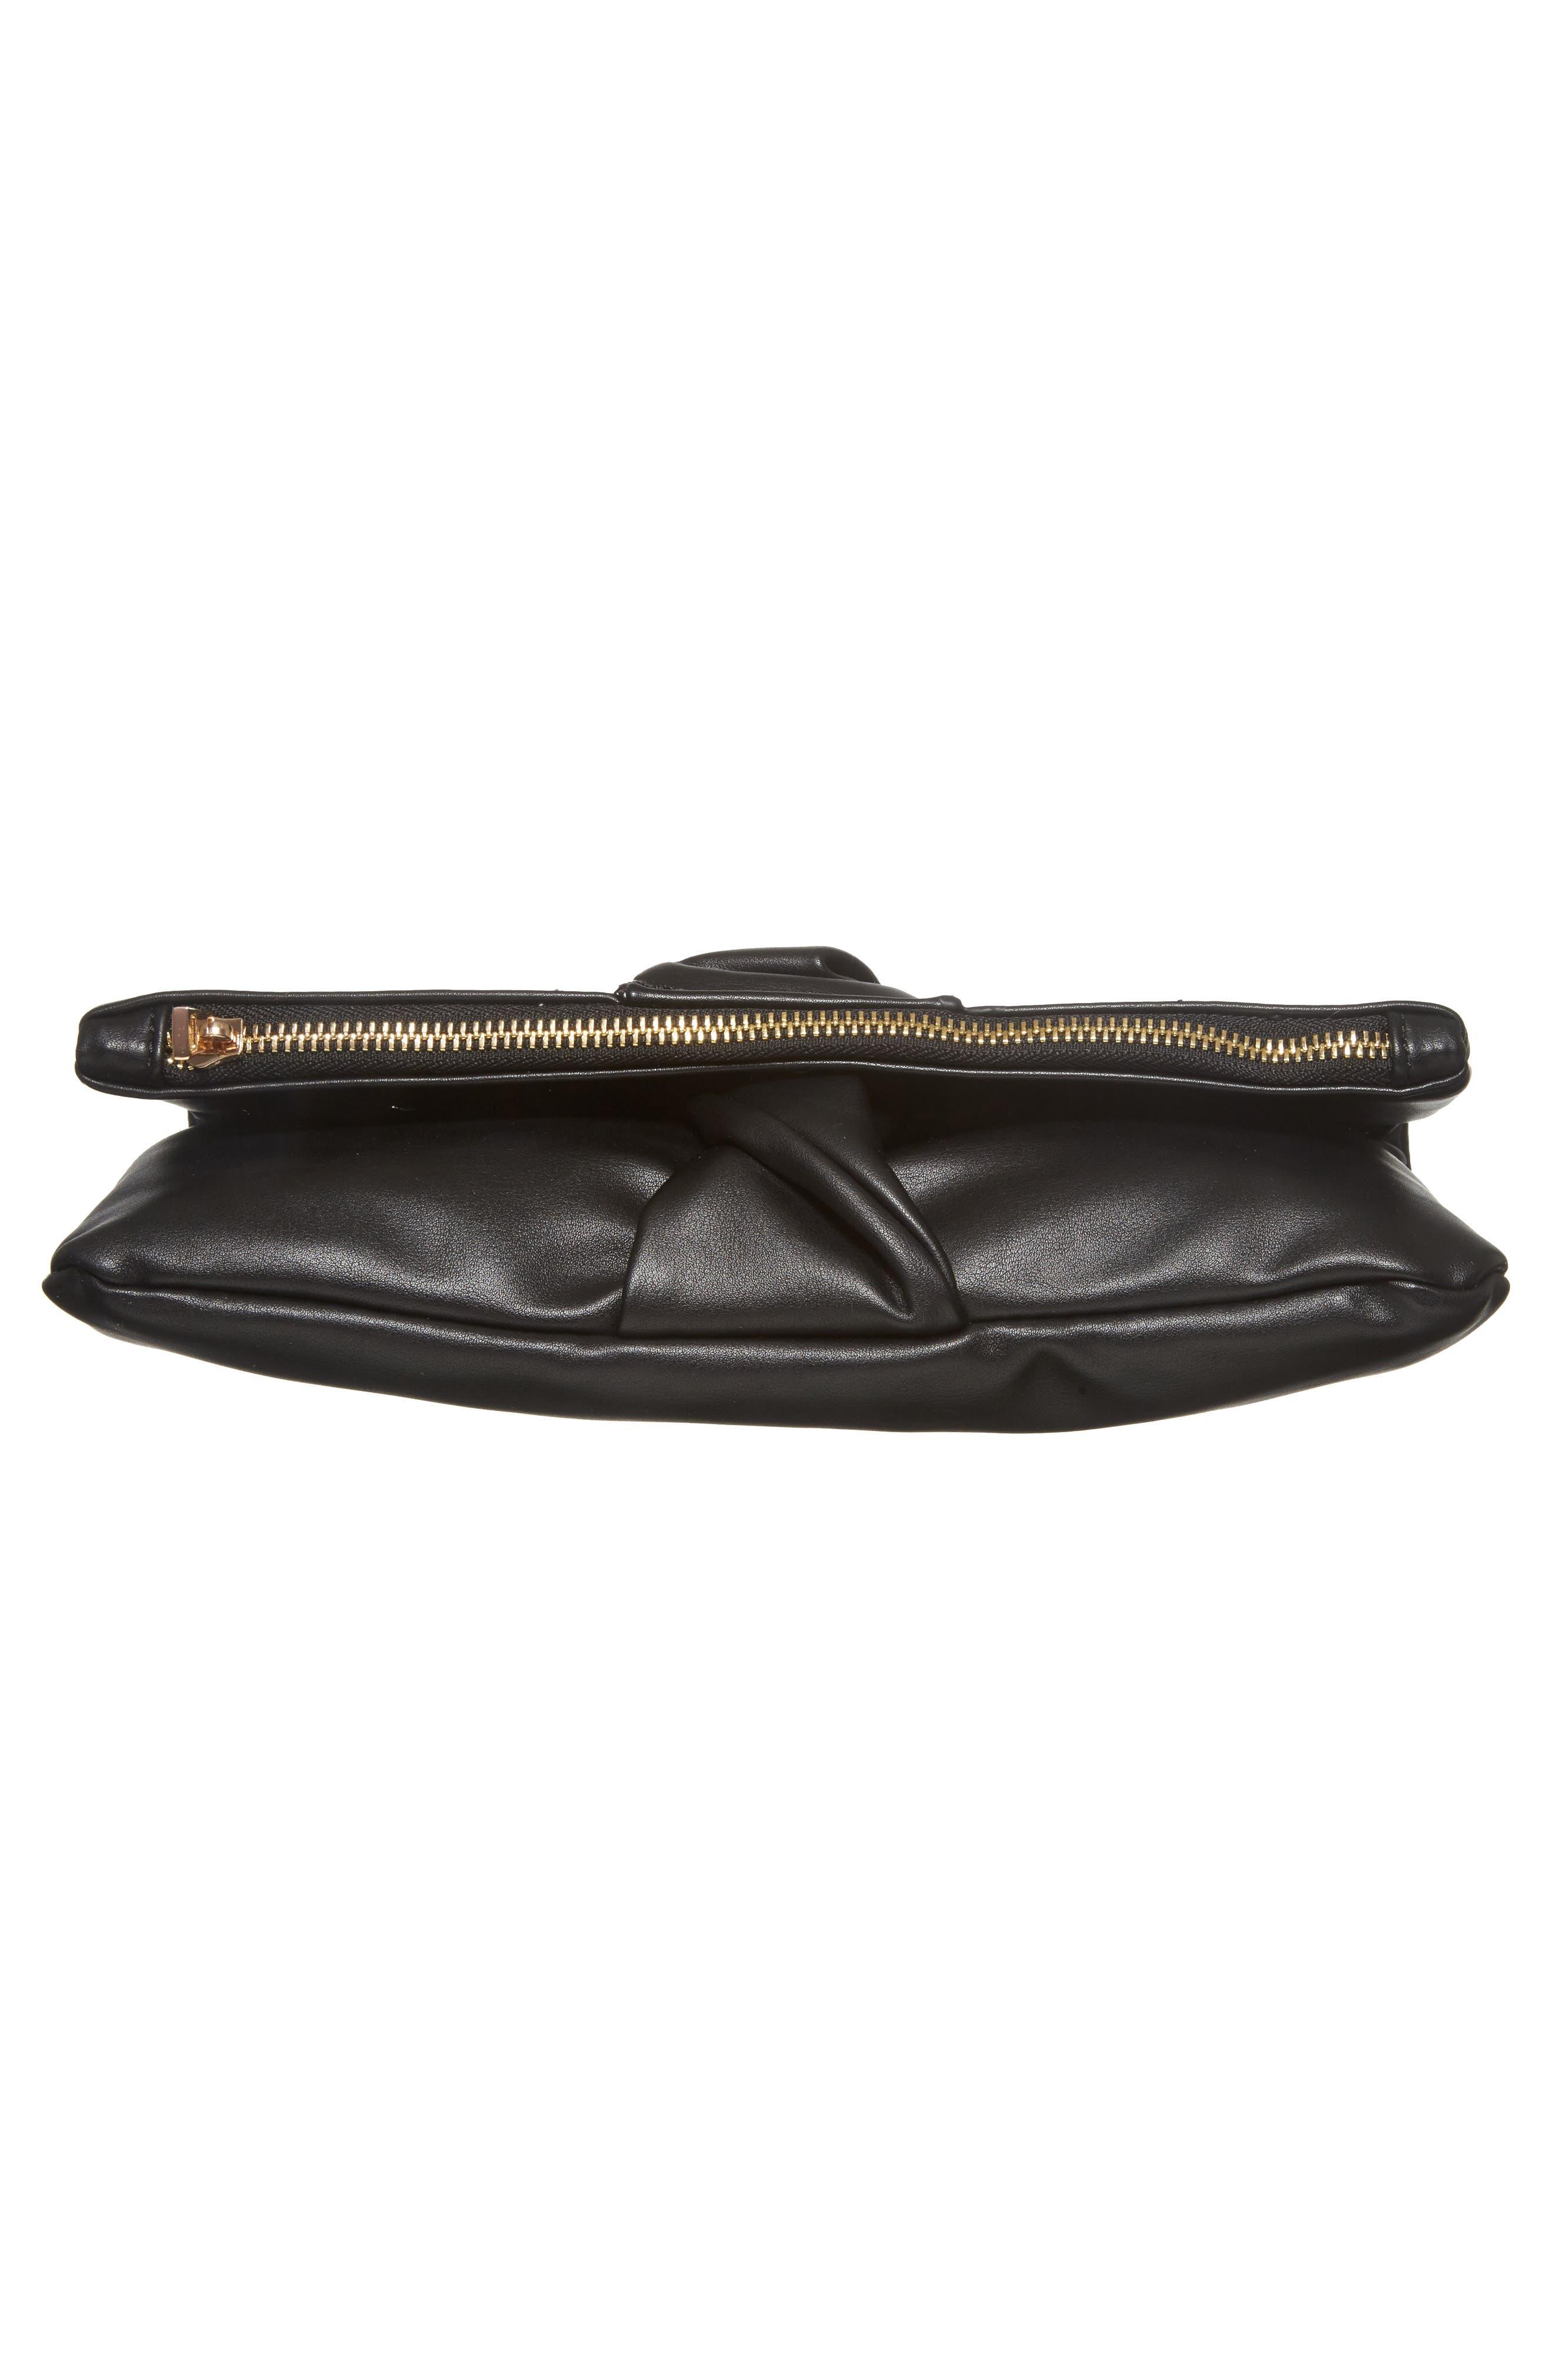 Lenore Foldover Faux Leather Clutch,                             Alternate thumbnail 6, color,                             001